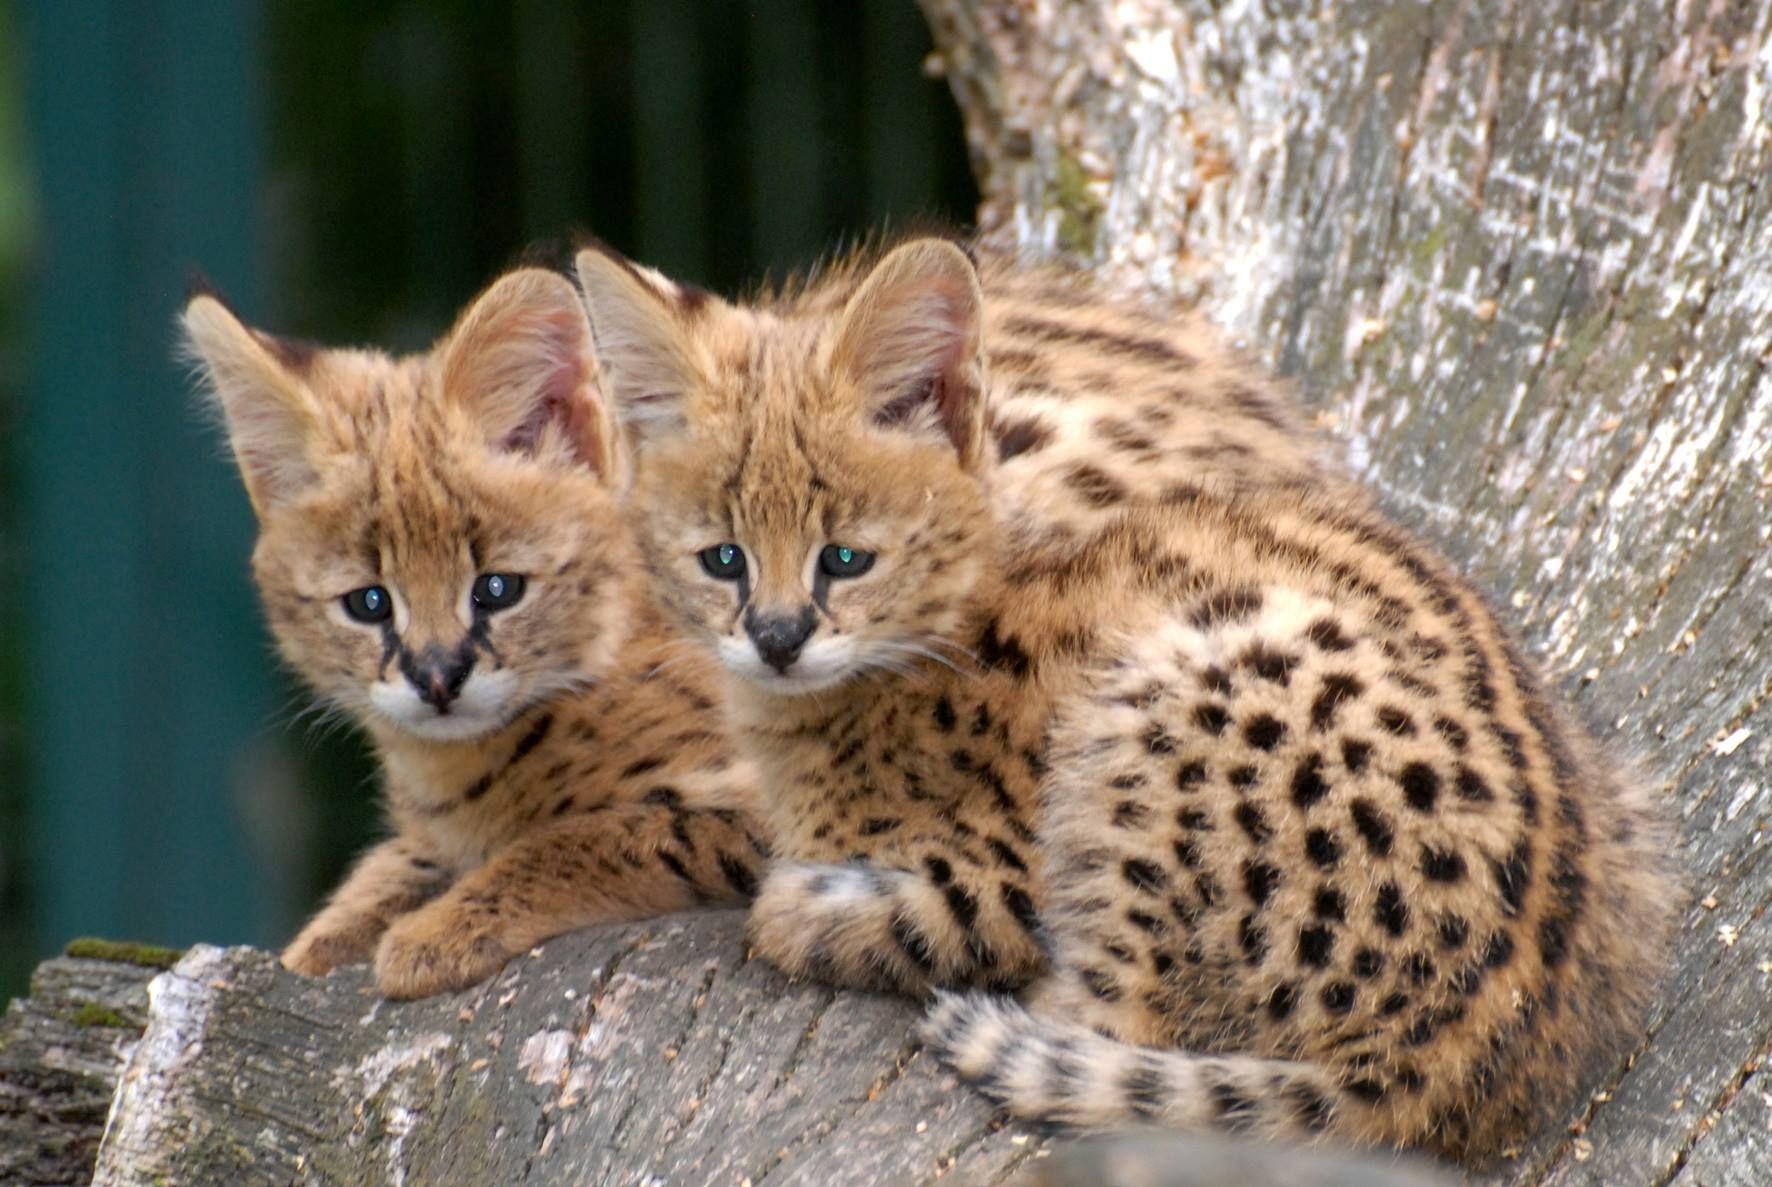 Baby Kitten Wildcats Wild cats, Baby kittens, Kittens